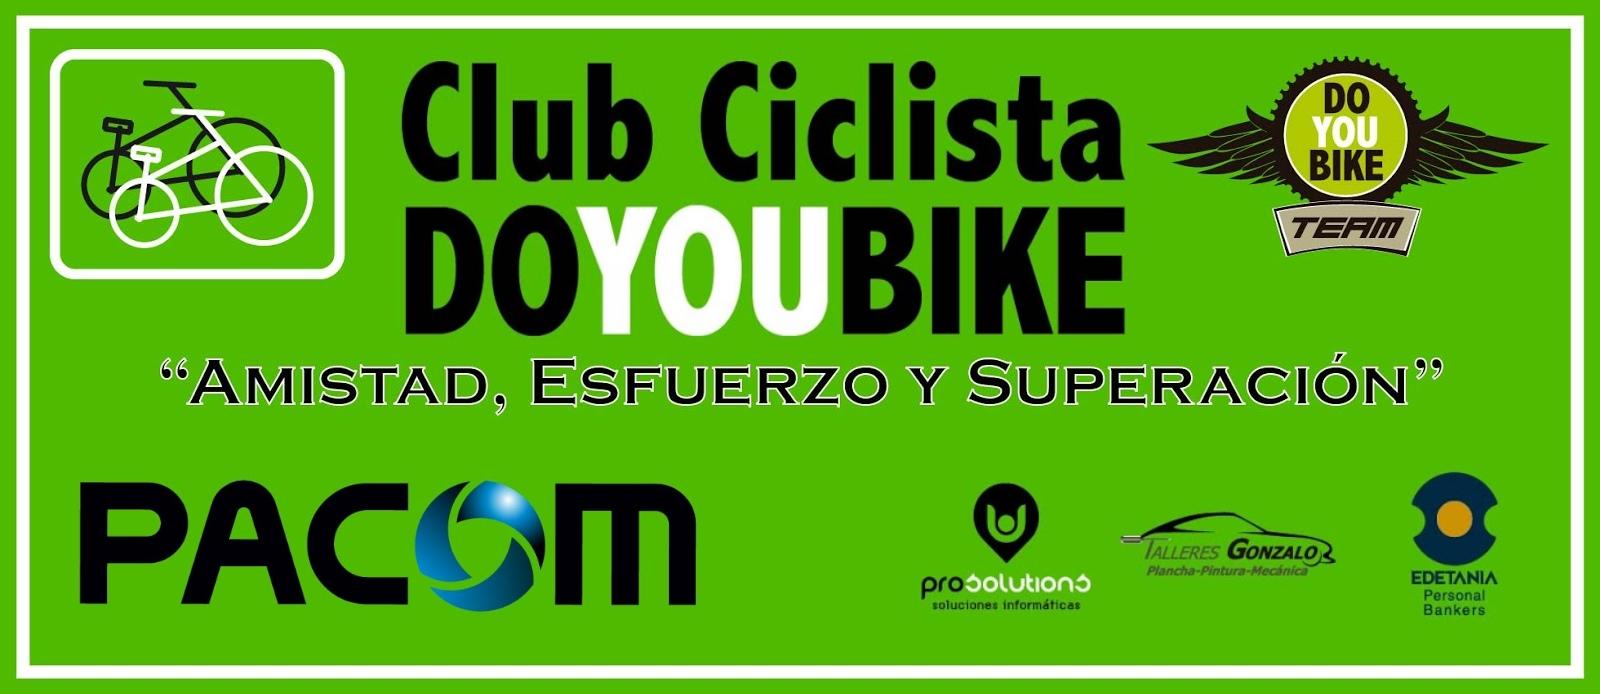 Club Ciclista DOYOUBIKE